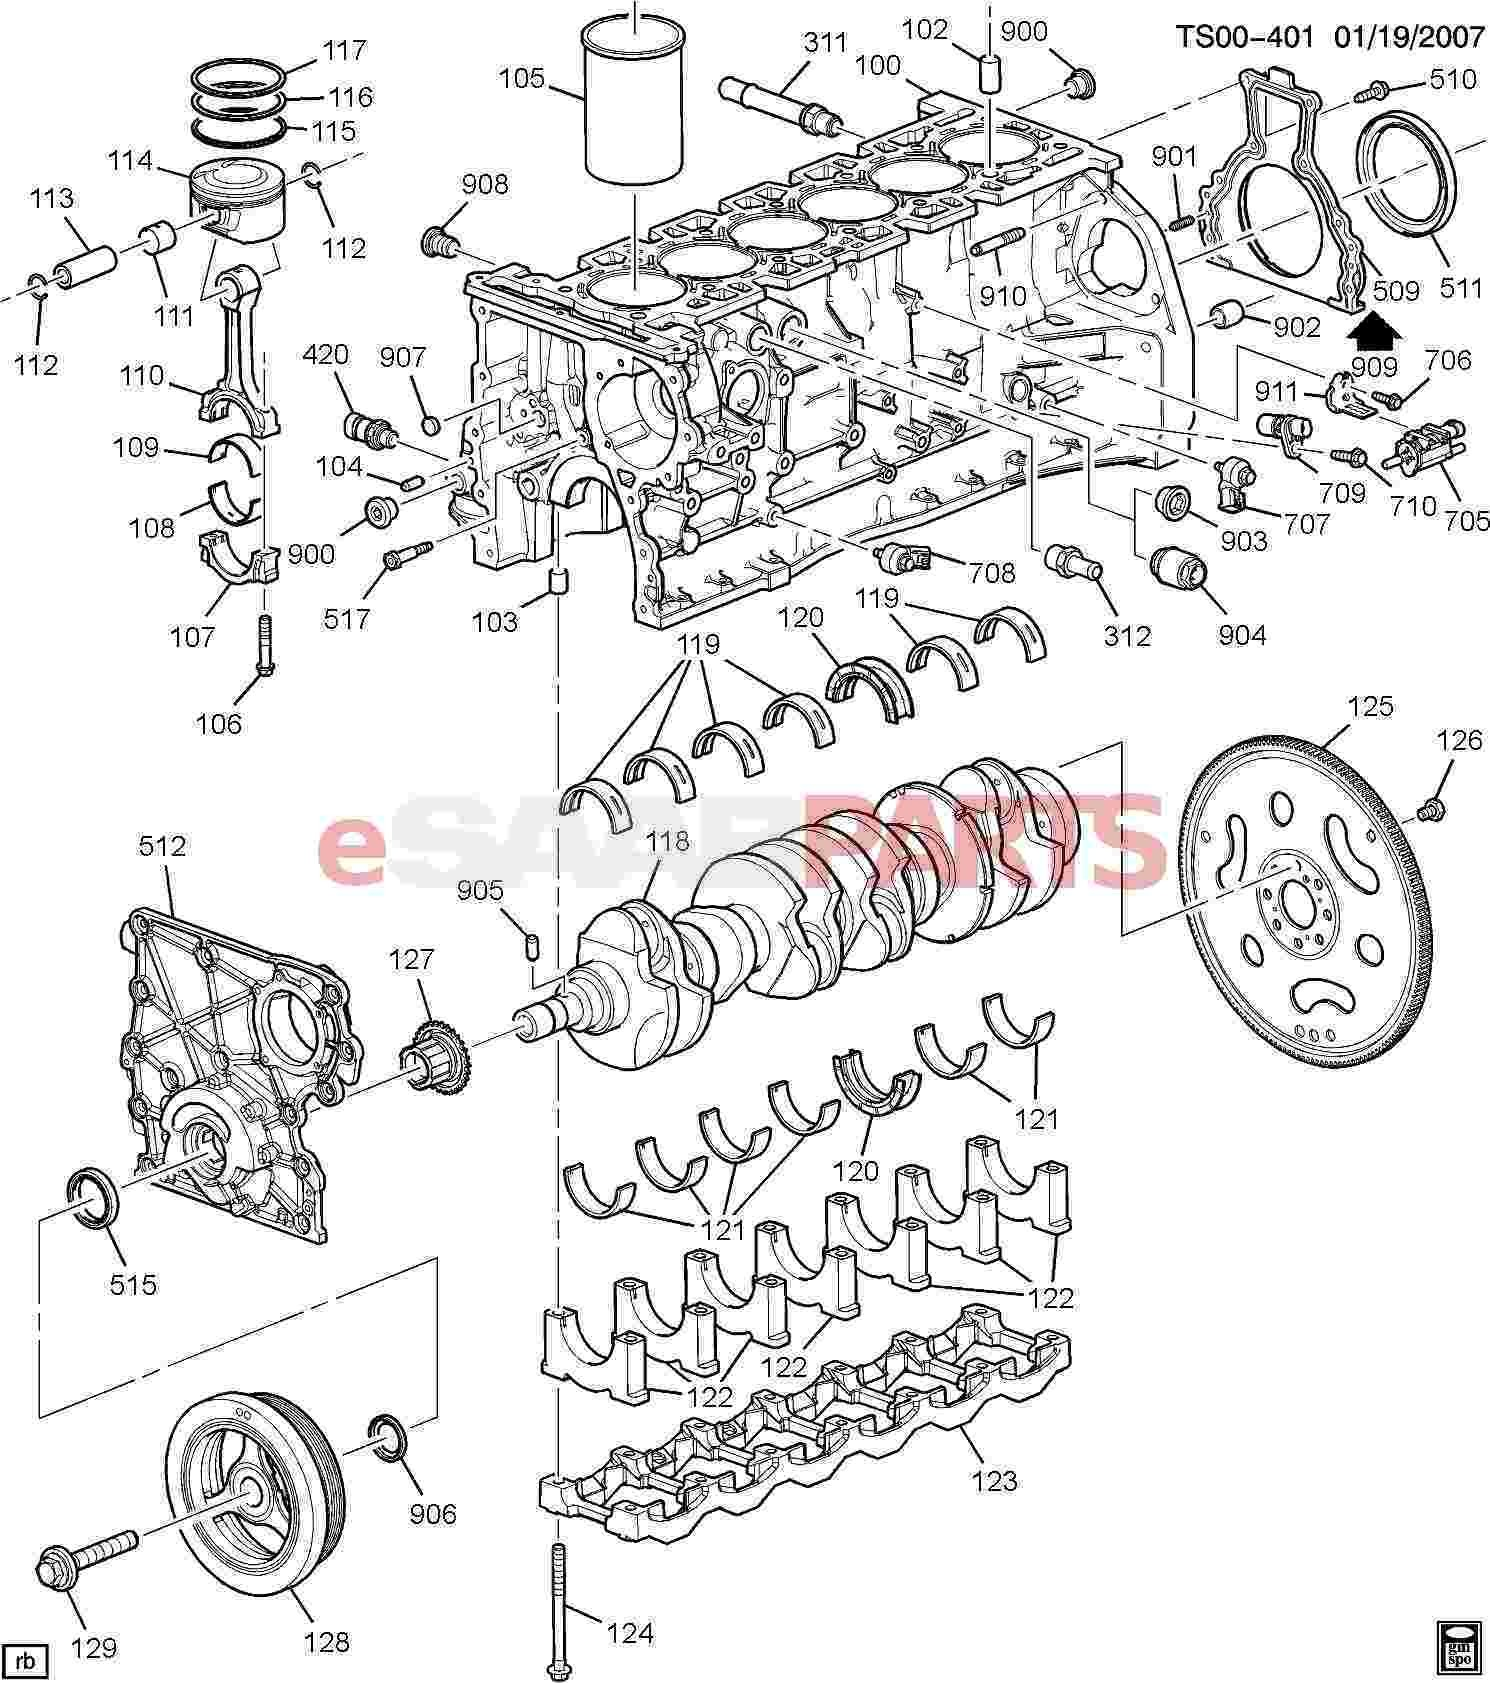 Auto Engine Parts Diagram | My Wiring DIagram